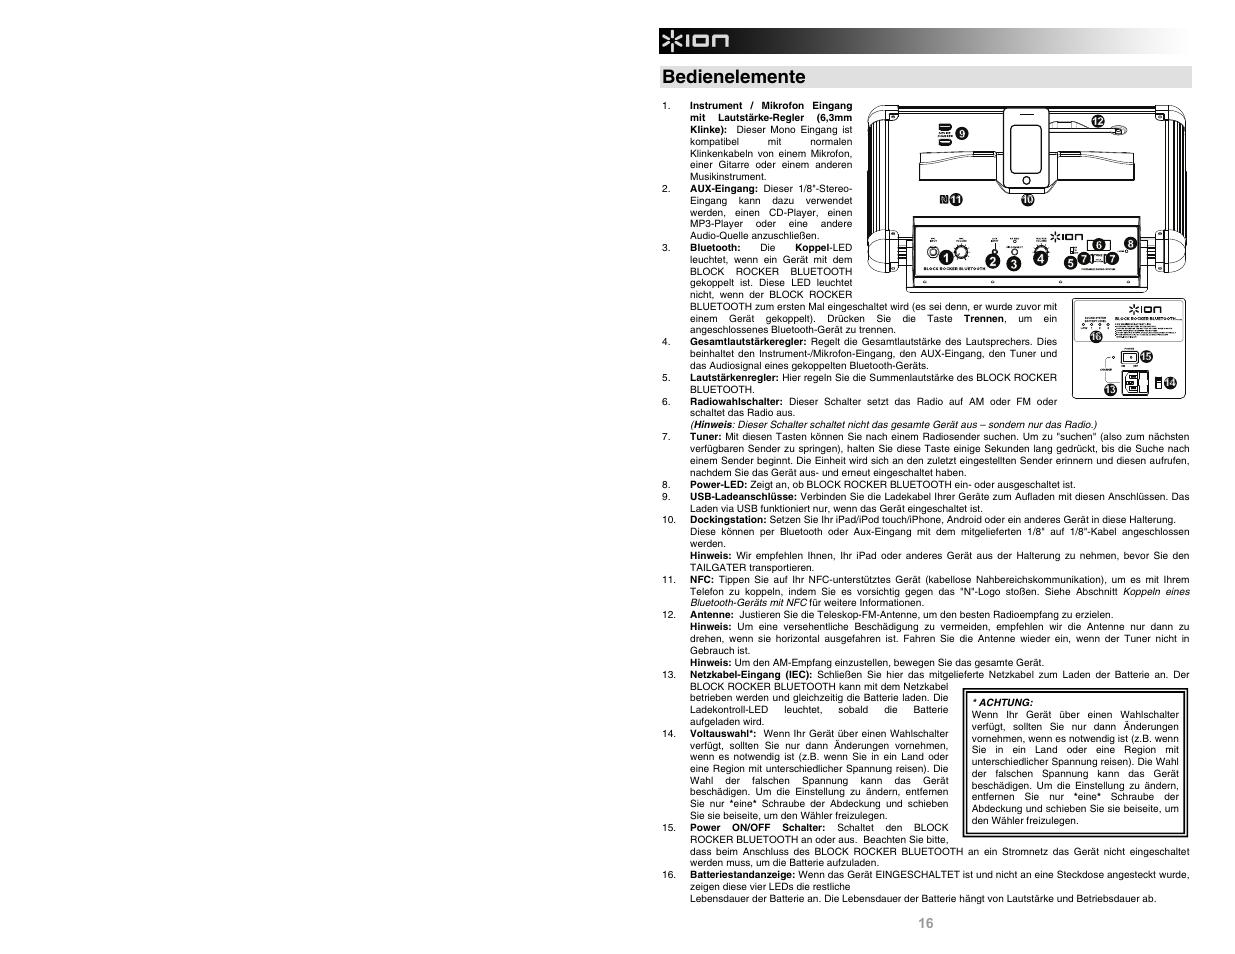 Bedienelemente | ION Audio Block Rocker Bluetooth iPA56C User Manual | Page  16 / 24